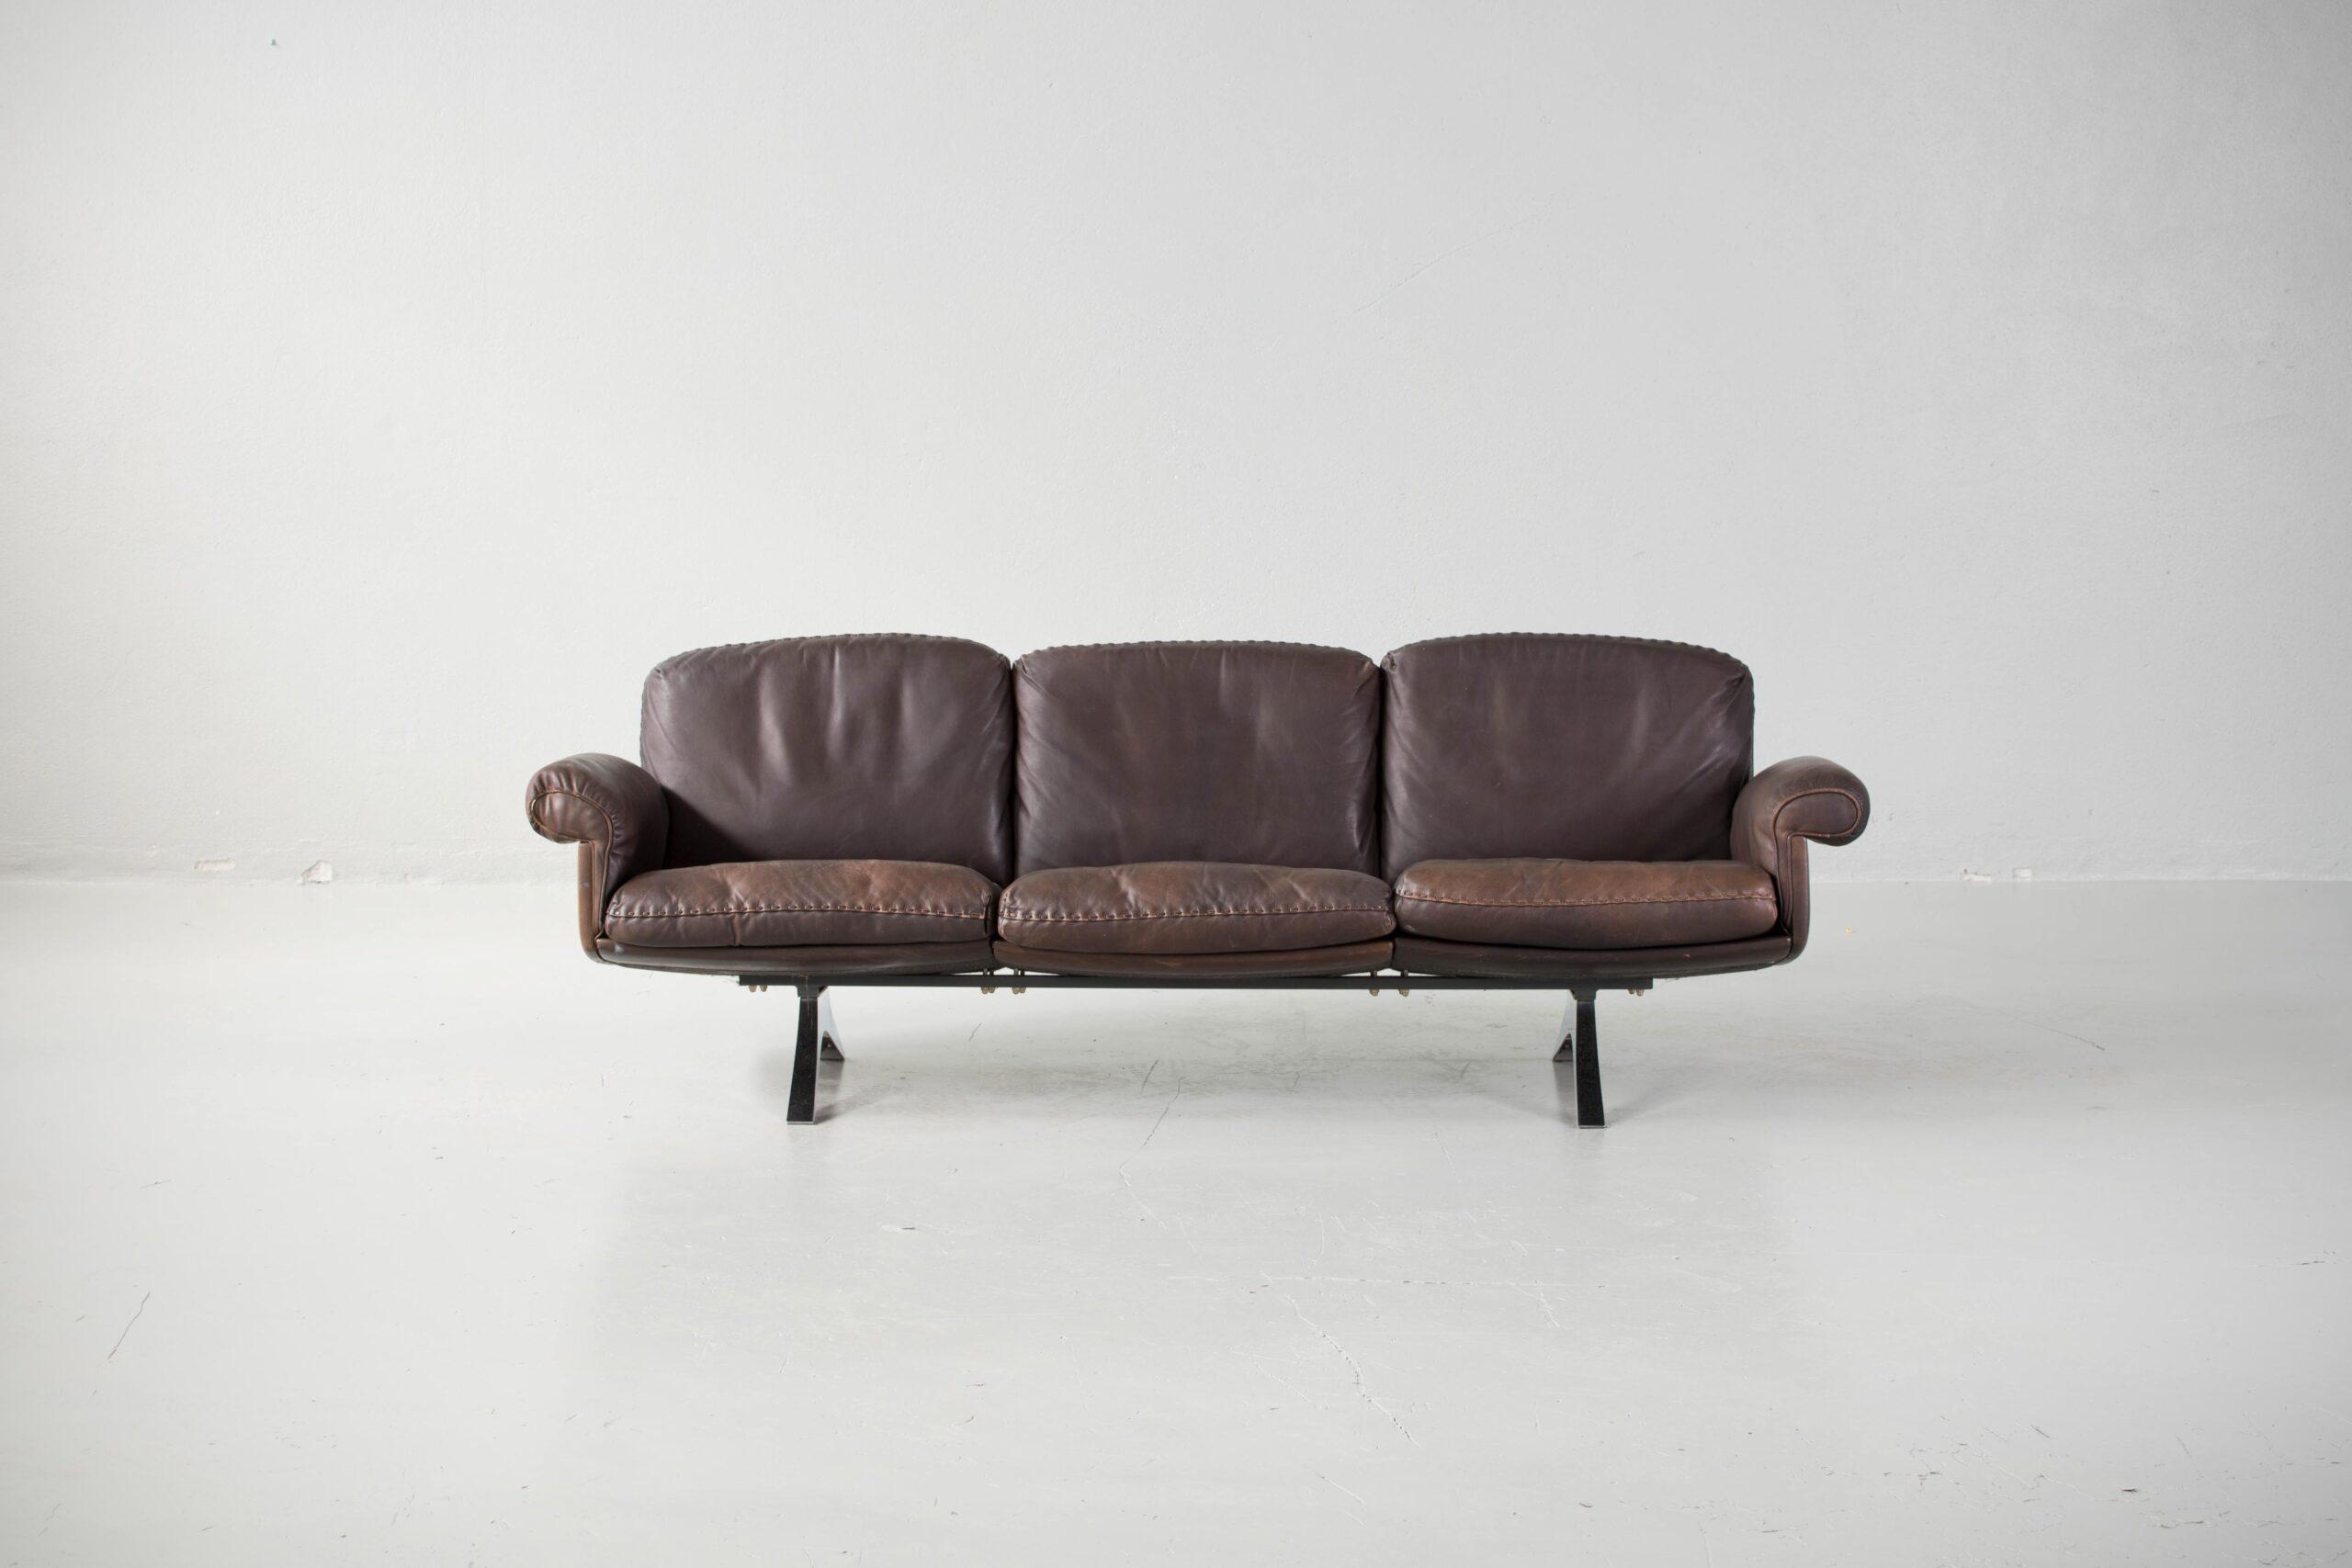 Full Size of De Sede Sofa Uk Ds 47 Gebraucht Kaufen Outlet 600 For Sale Leder Sessel Furniture Endless Bi Preise By 1970s Model Ds31 Home Affair Hay Mags Bad Sooden Sofa De Sede Sofa